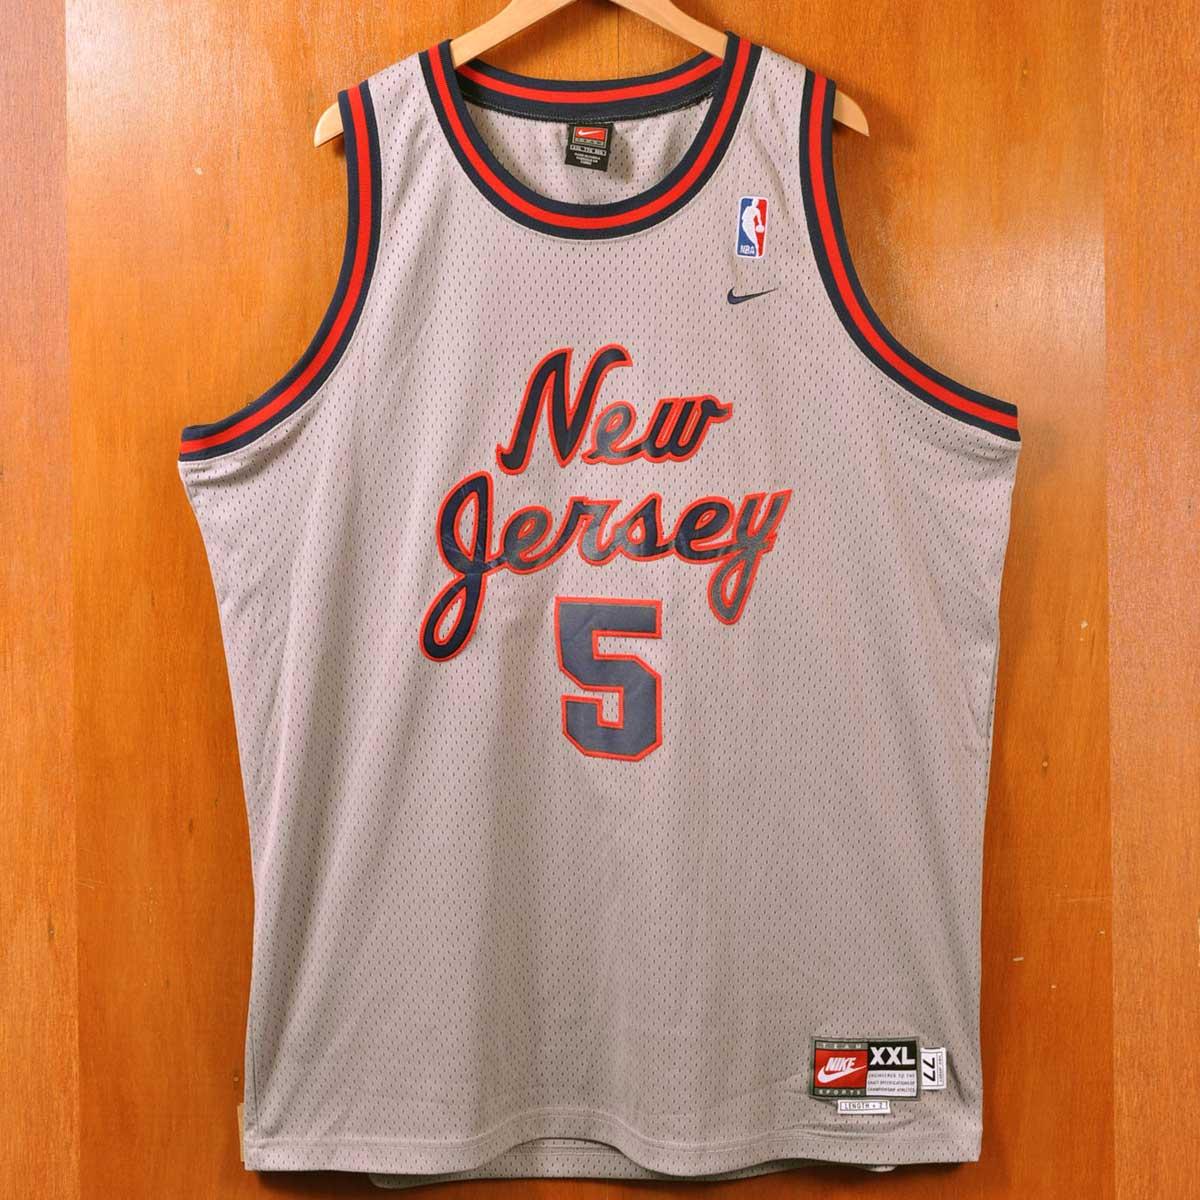 de9ed2e5bb9 NIKE Nike NBA New Jersey Nets New Jersey Nets Jason Kidd basketball tank  top uniform numbering ...